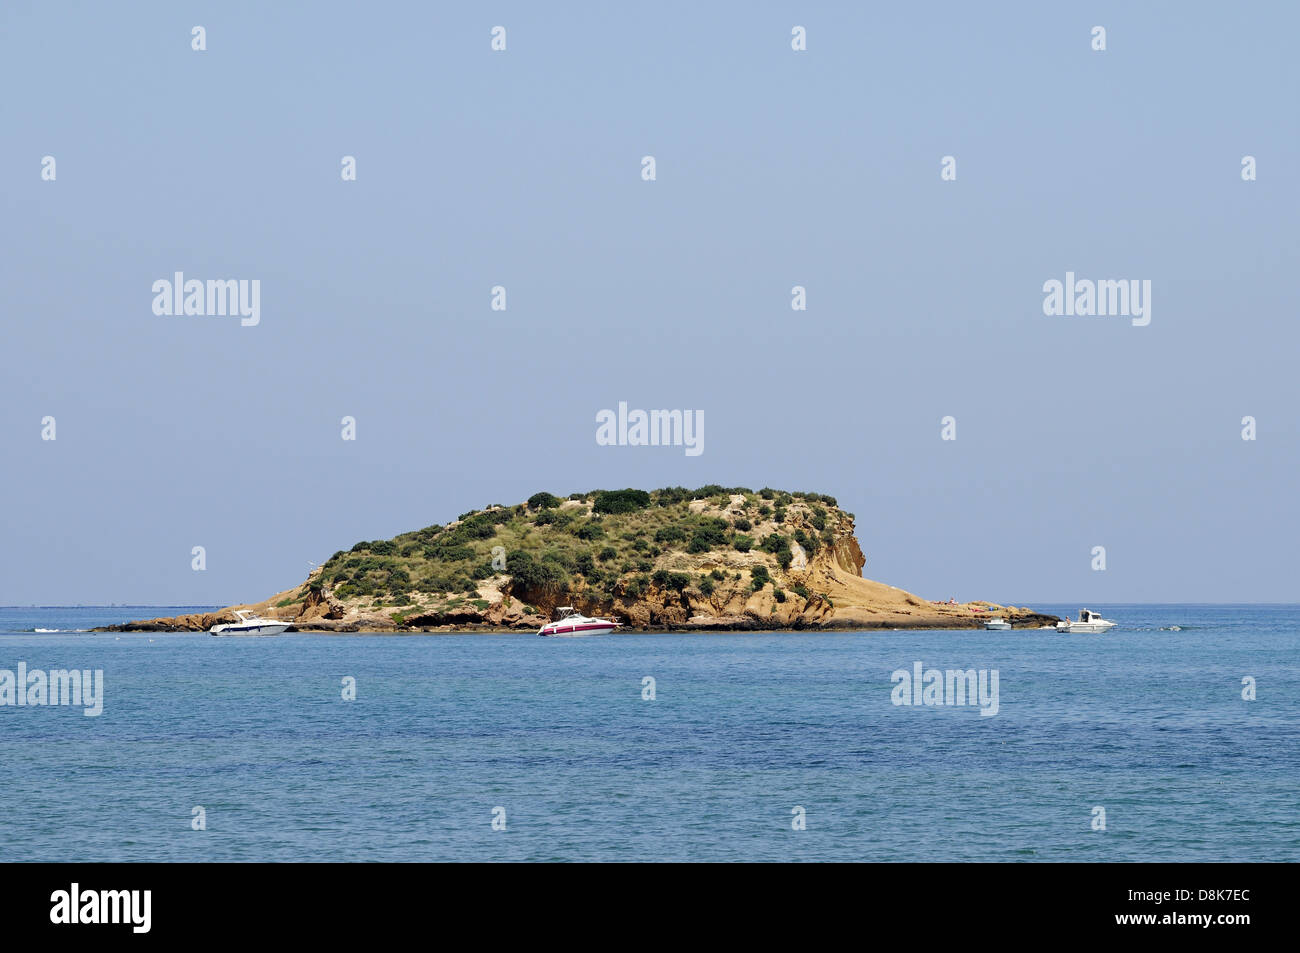 kleine Insel - Stock Image